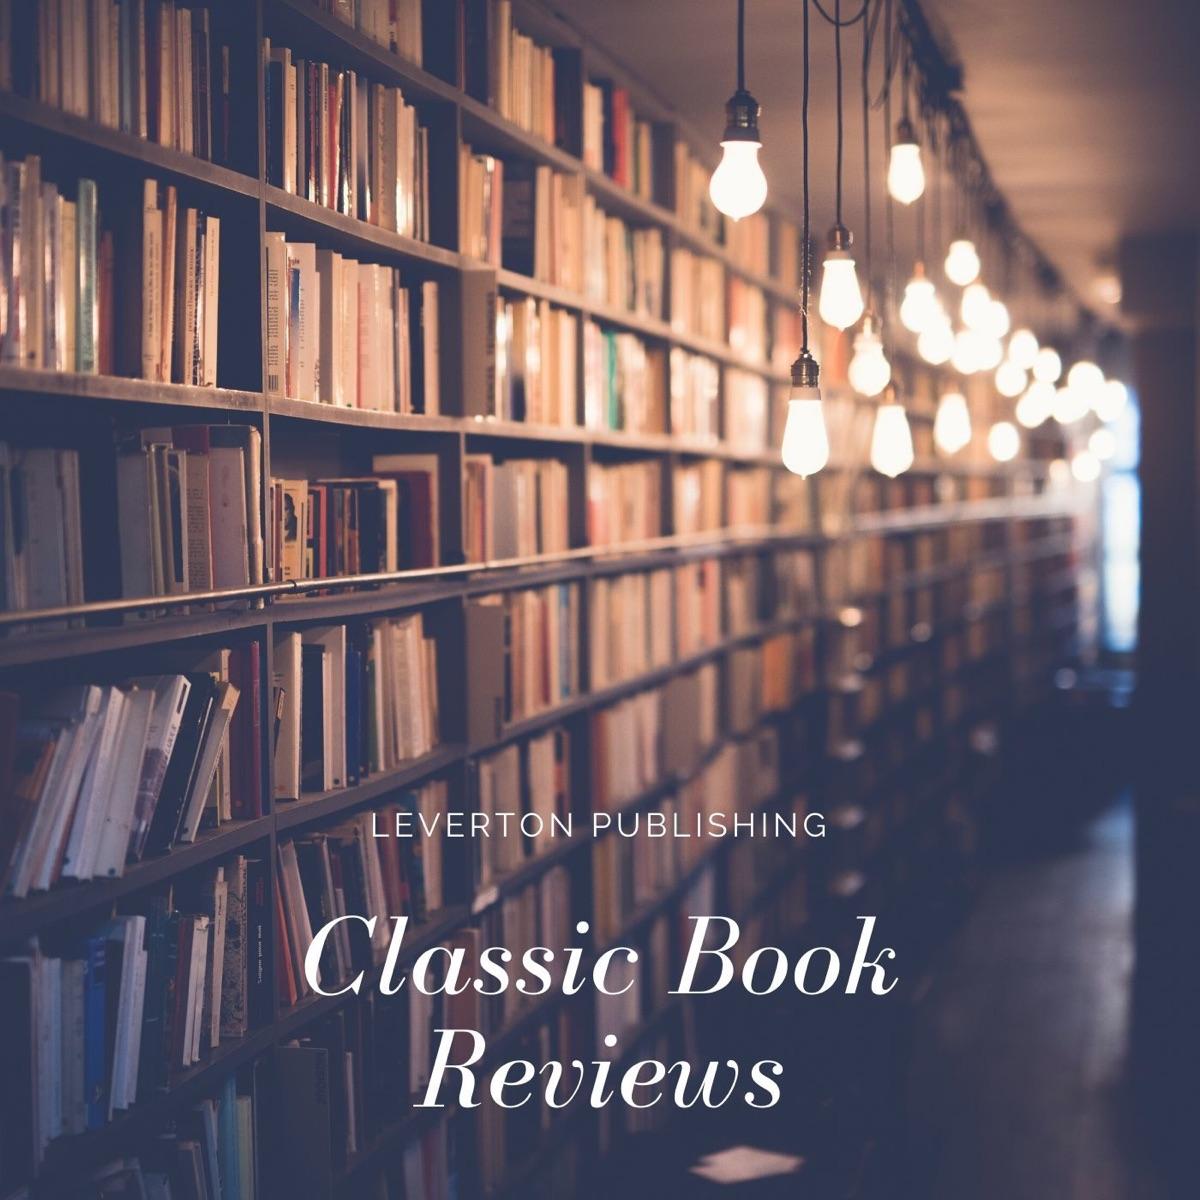 Classic Book Reviews